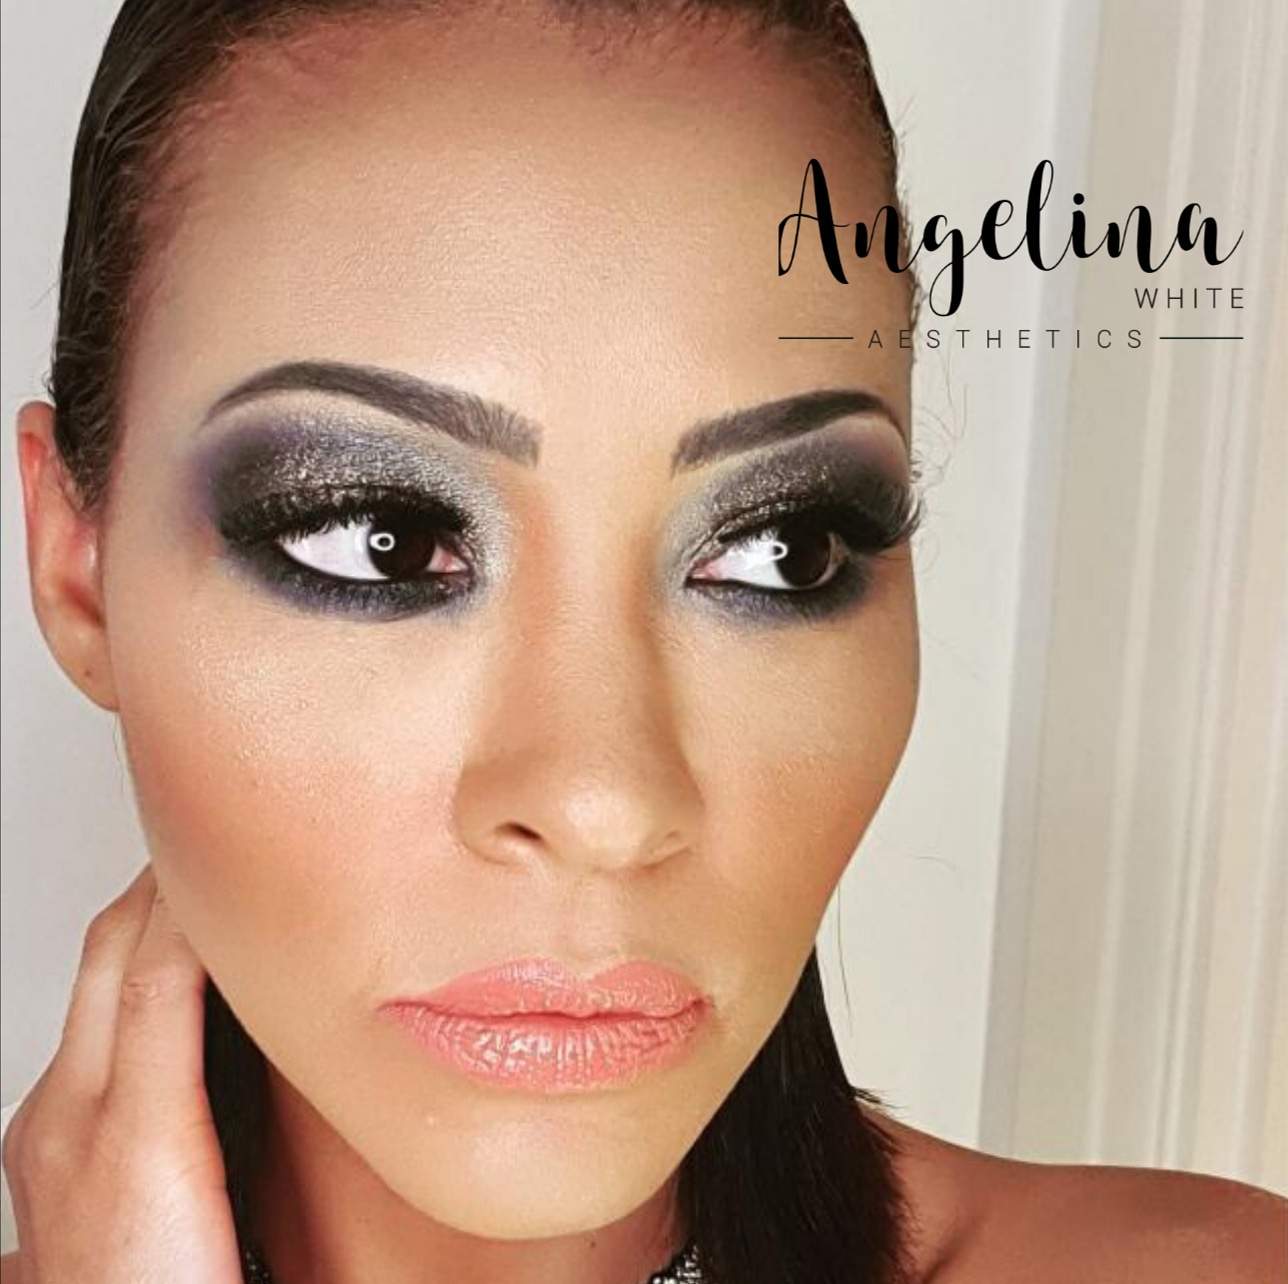 Angelina White Aesthetics